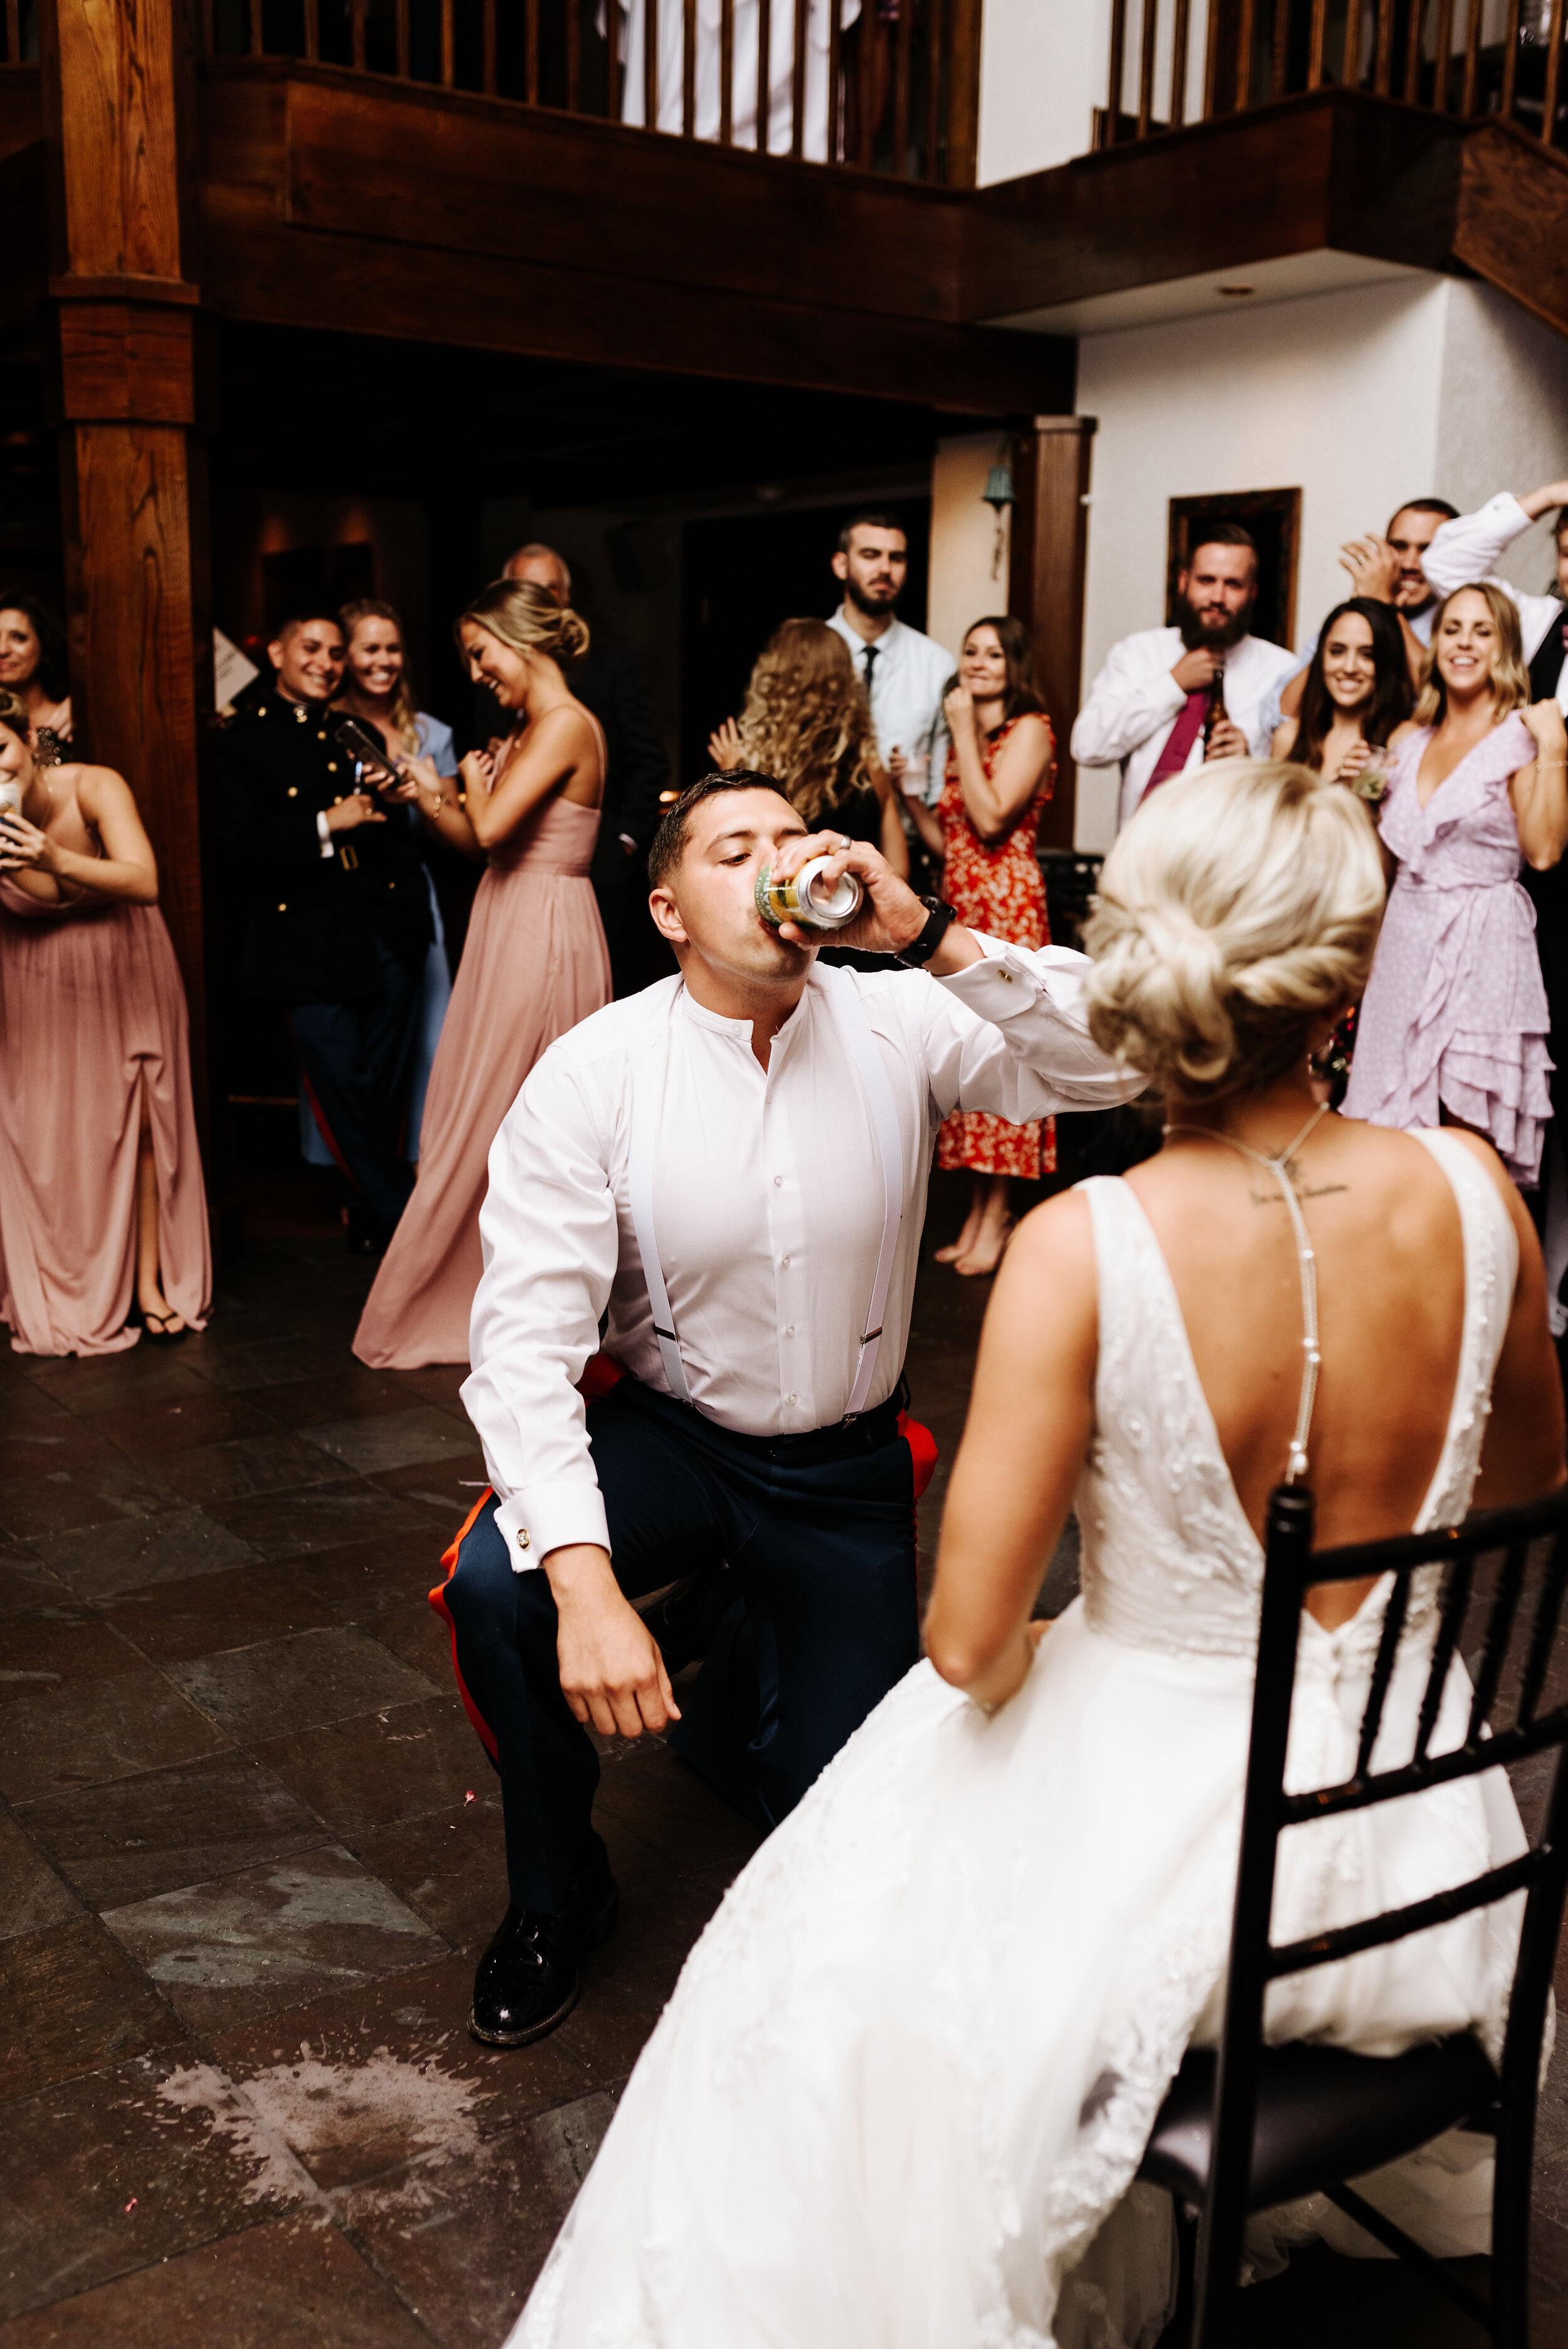 Emily_Mike_Wedding_Celebrations_at_the_Reservoir_Pool_Pavilion_Richmond_Virginia_Wedding_Photographer_Photography_by_V_111.jpg